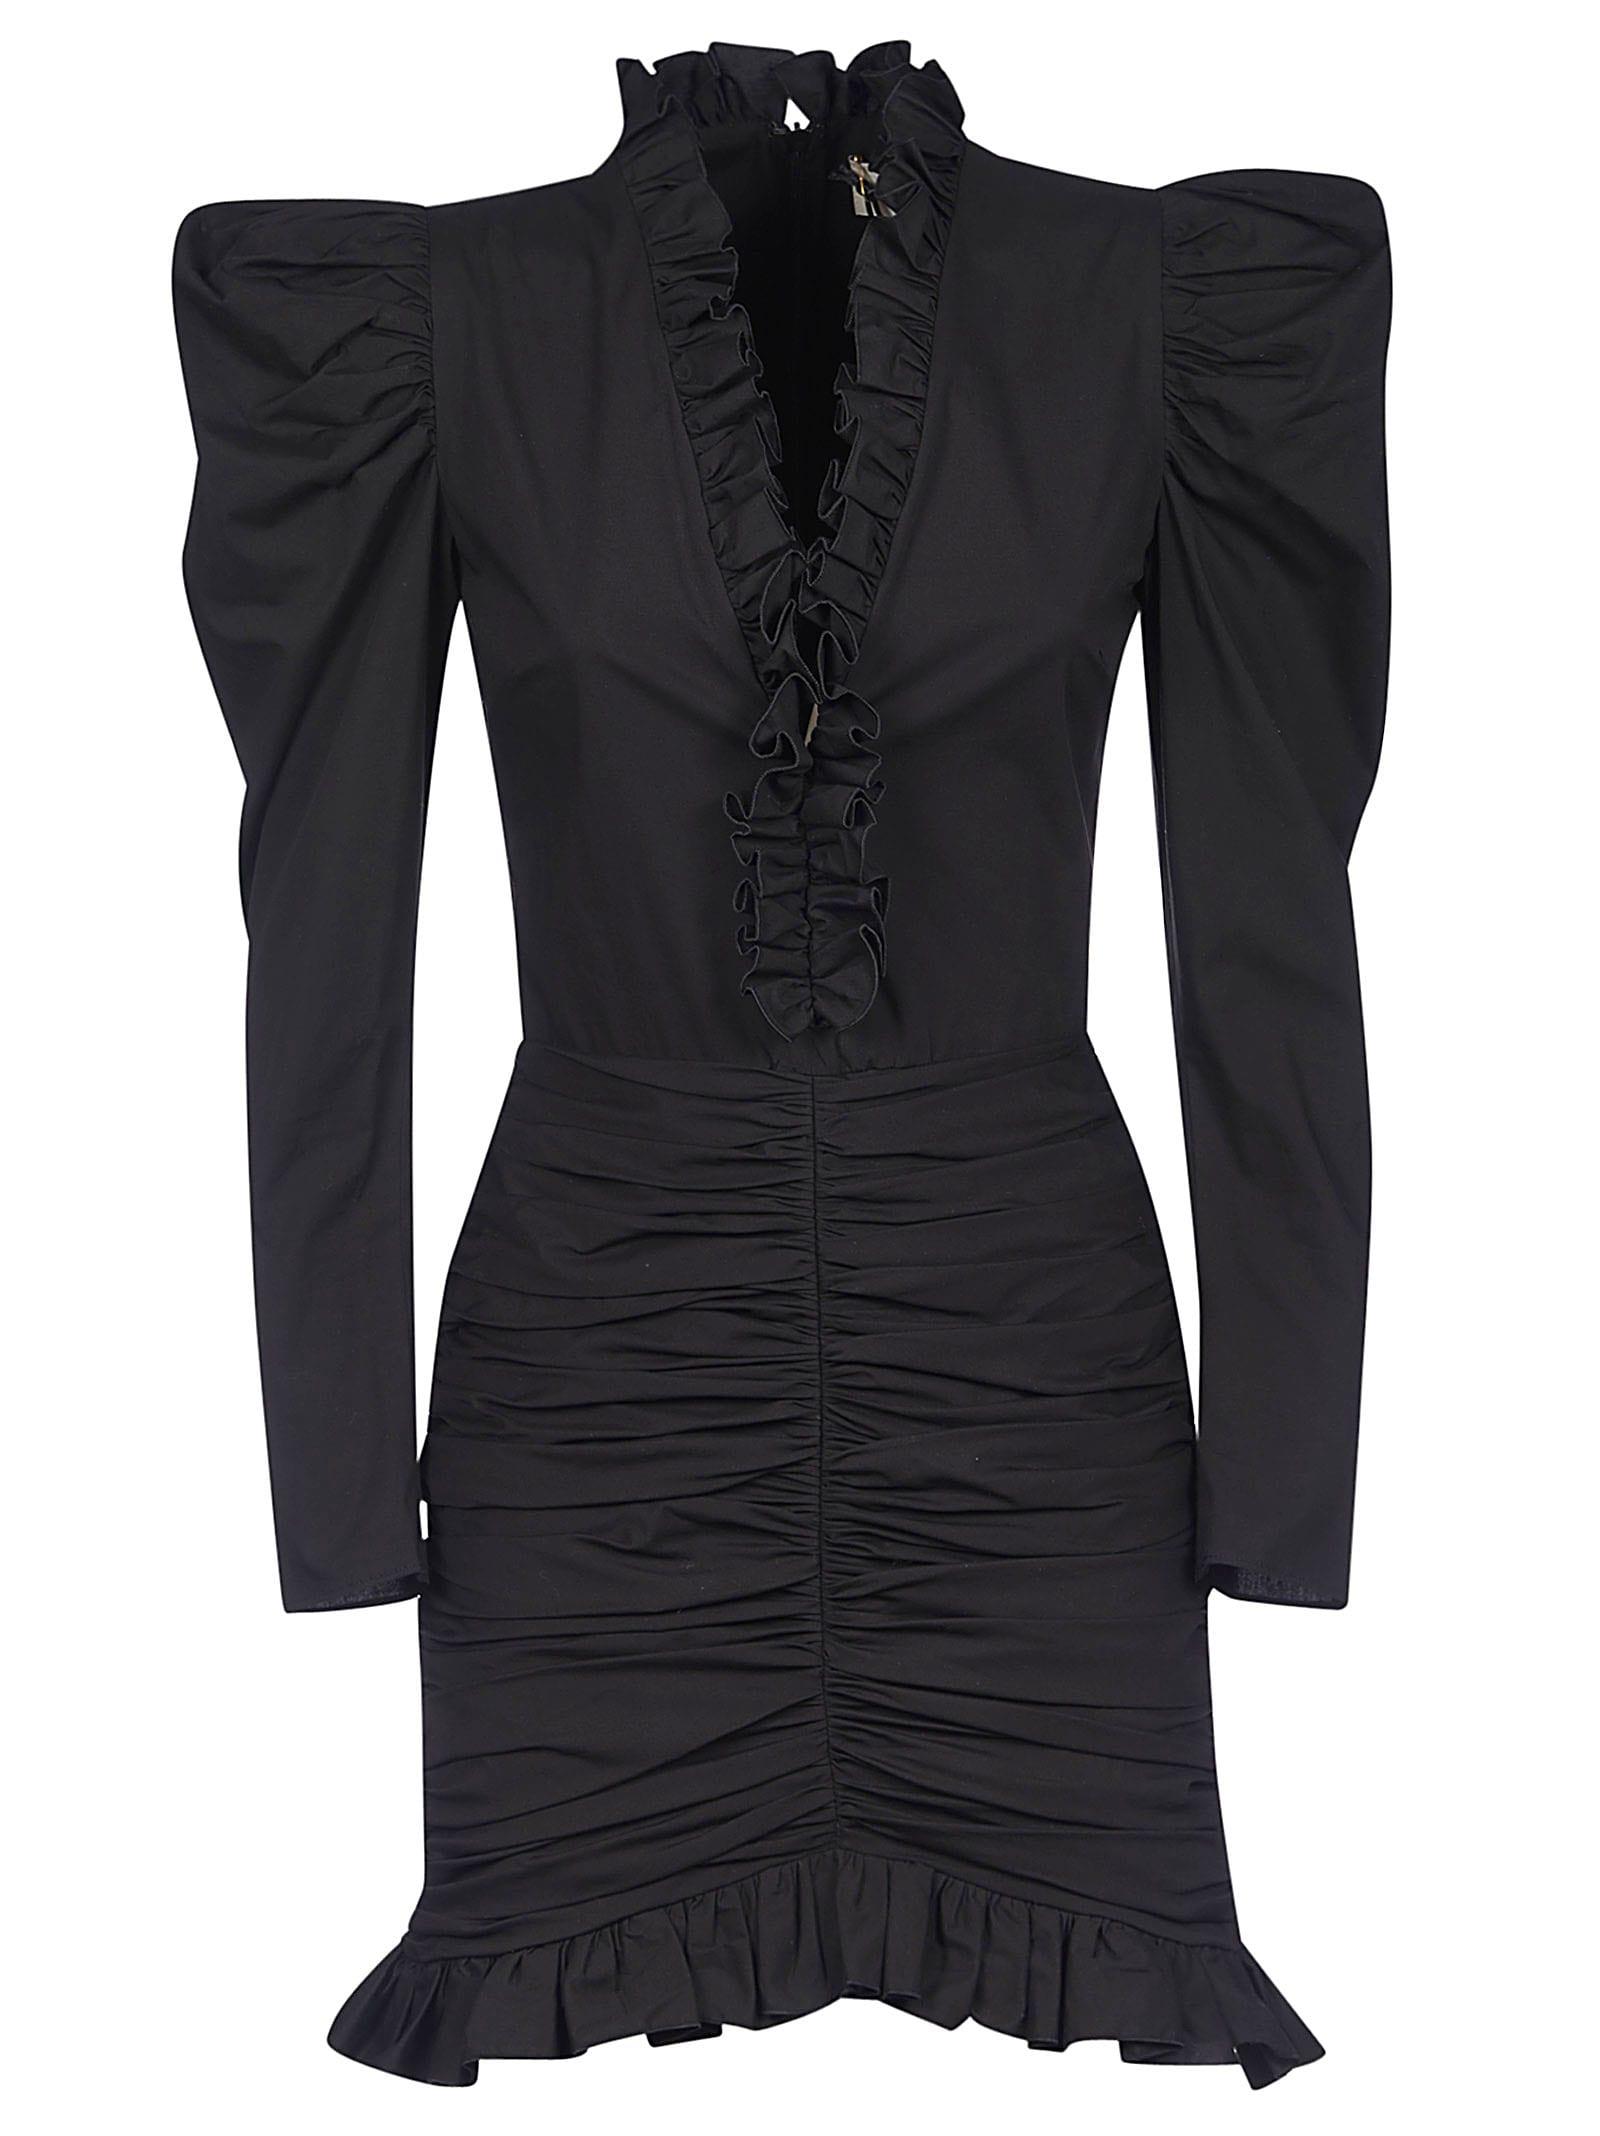 Buy Giuseppe di Morabito Ruffle Detail V-neck Dress online, shop Giuseppe di Morabito with free shipping